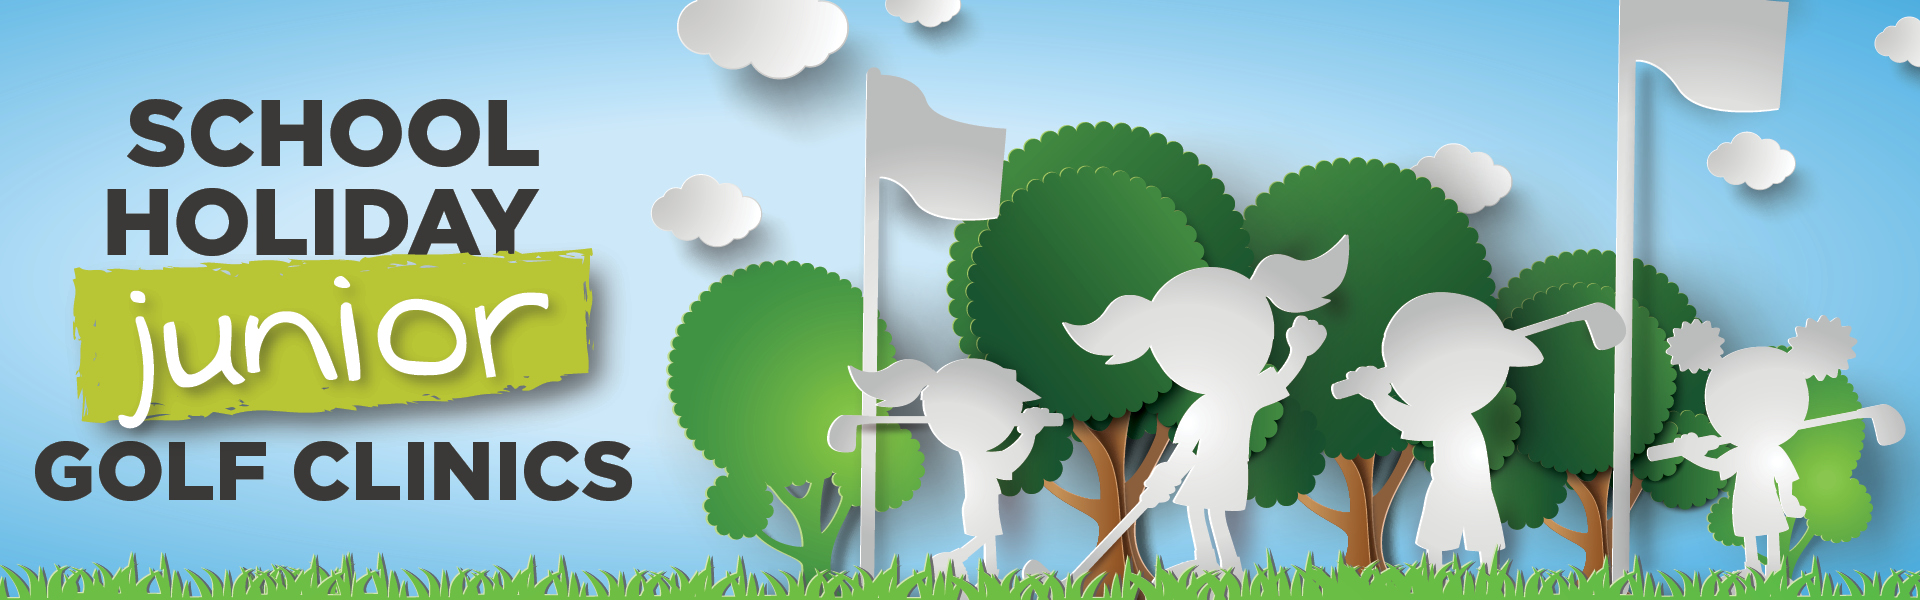 School Holiday Junior Golf Clinics